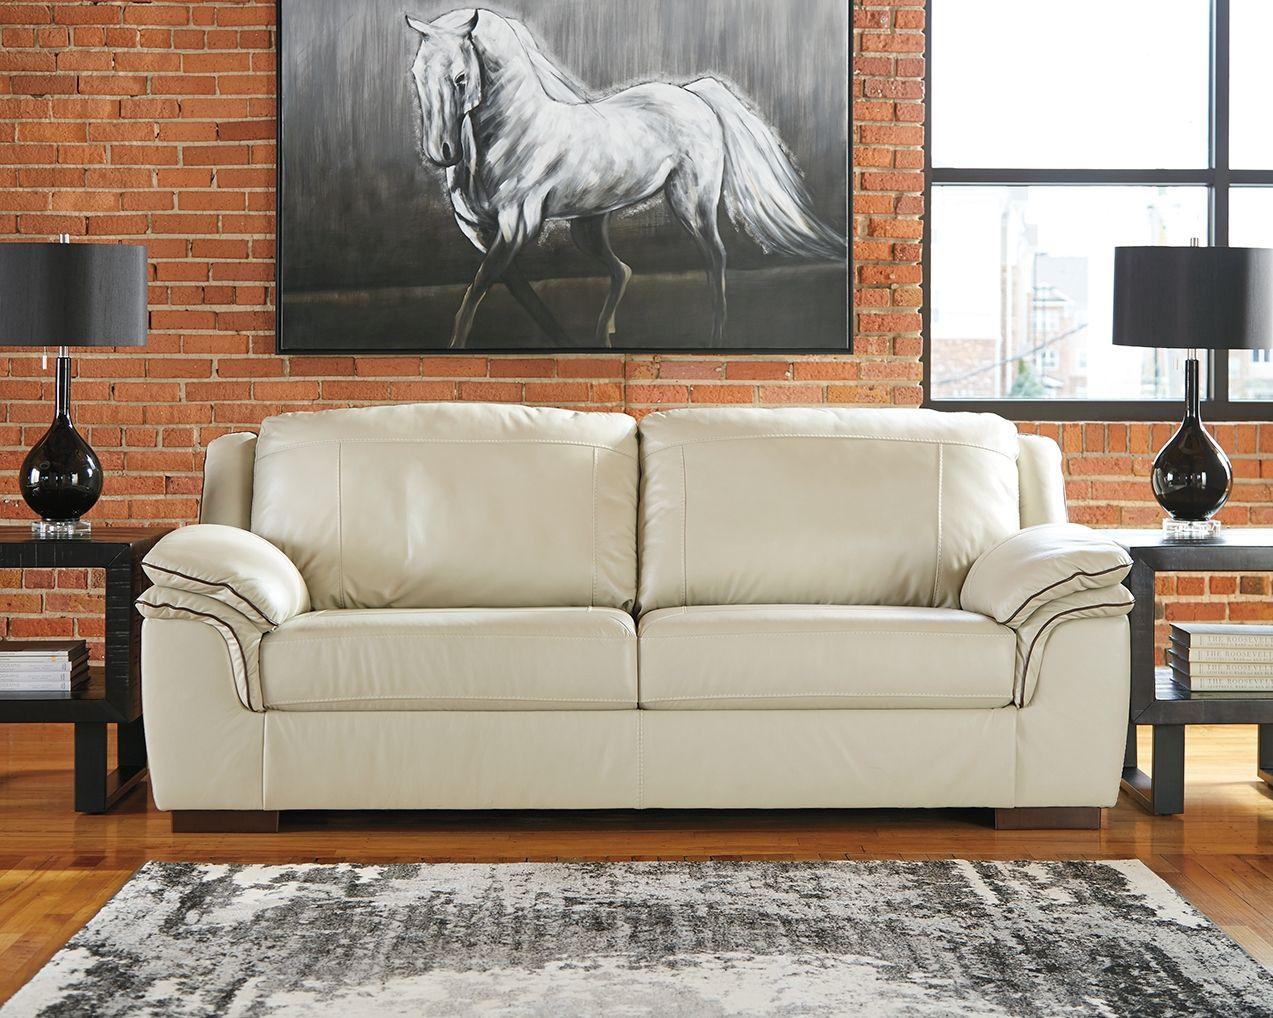 Surprising Islebrook Sofa Vanilla Leather Products Sofa Cream Spiritservingveterans Wood Chair Design Ideas Spiritservingveteransorg